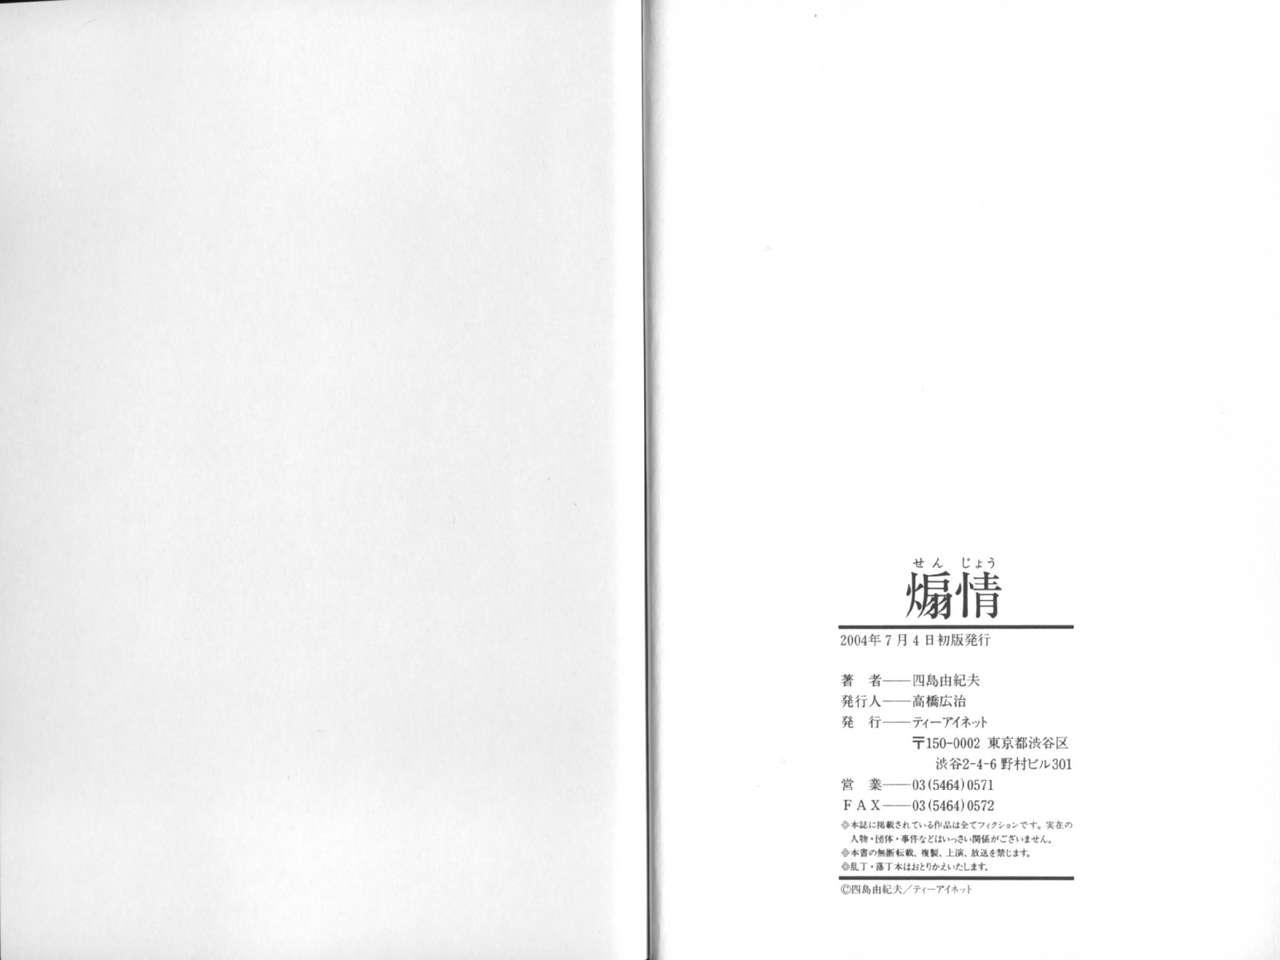 Senjou - A Desire is Instigated 96